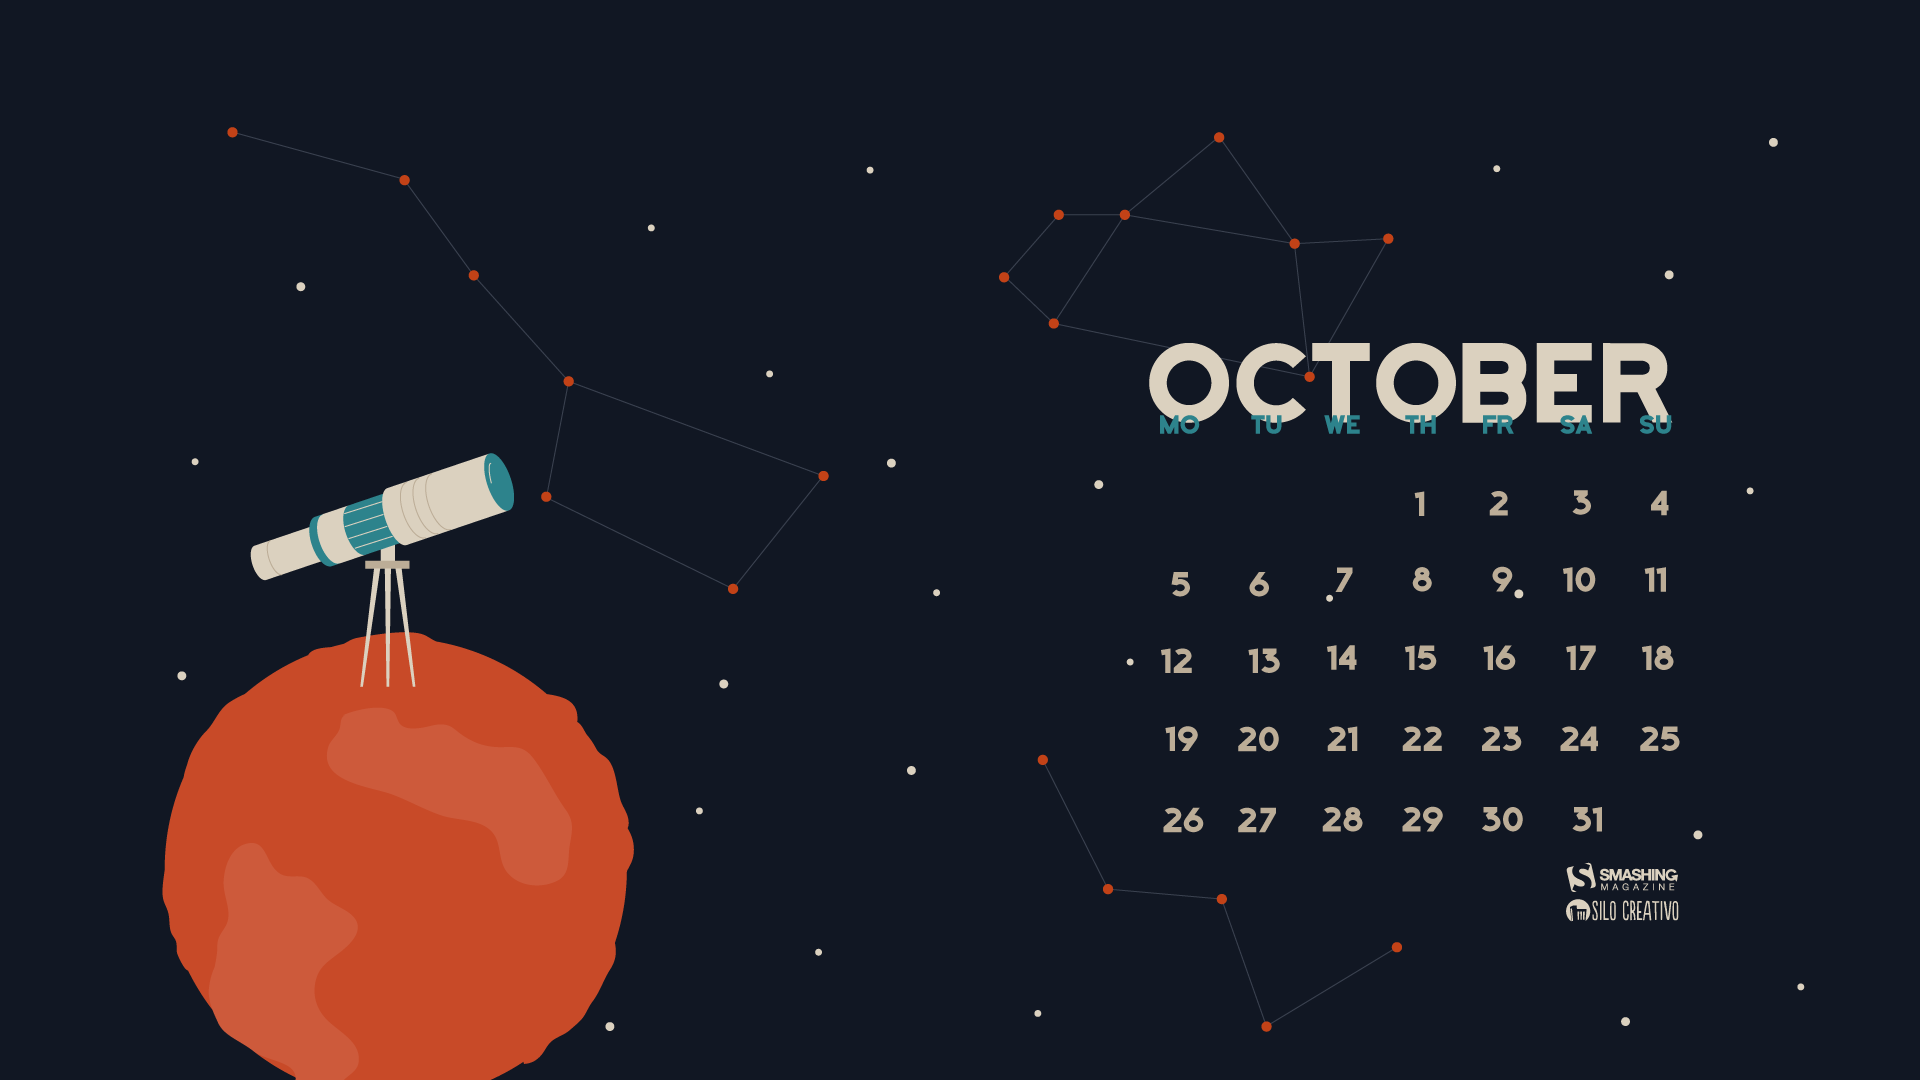 Desktop Wallpaper Calendars October 2015 Smashing Magazine